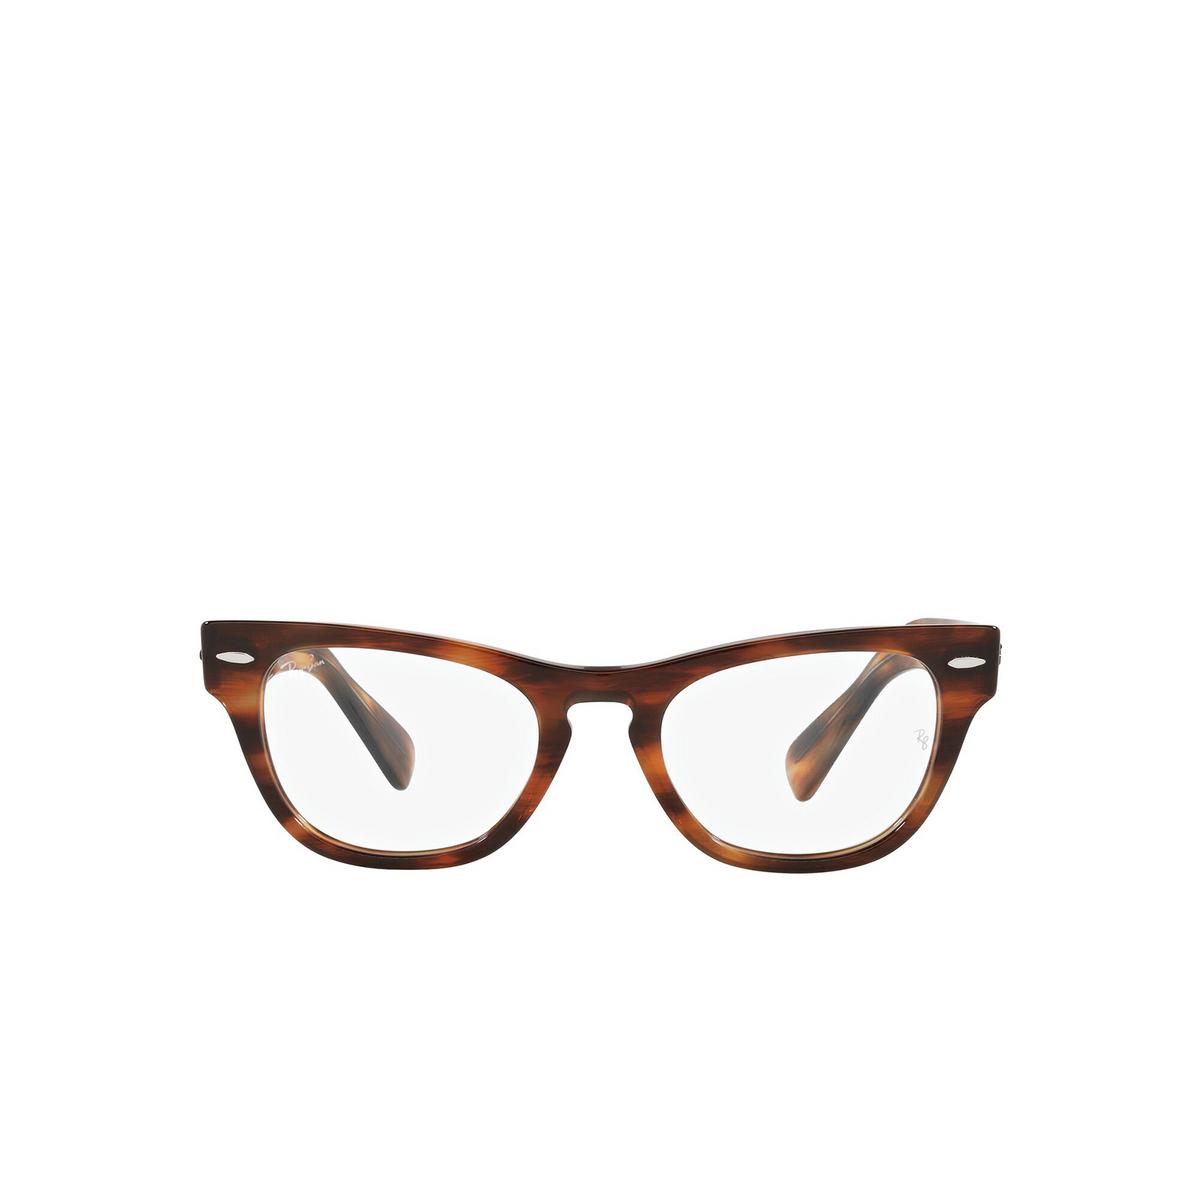 Ray-Ban® Cat-eye Eyeglasses: Laramie RX2201V color Striped Havana 2144 - front view.